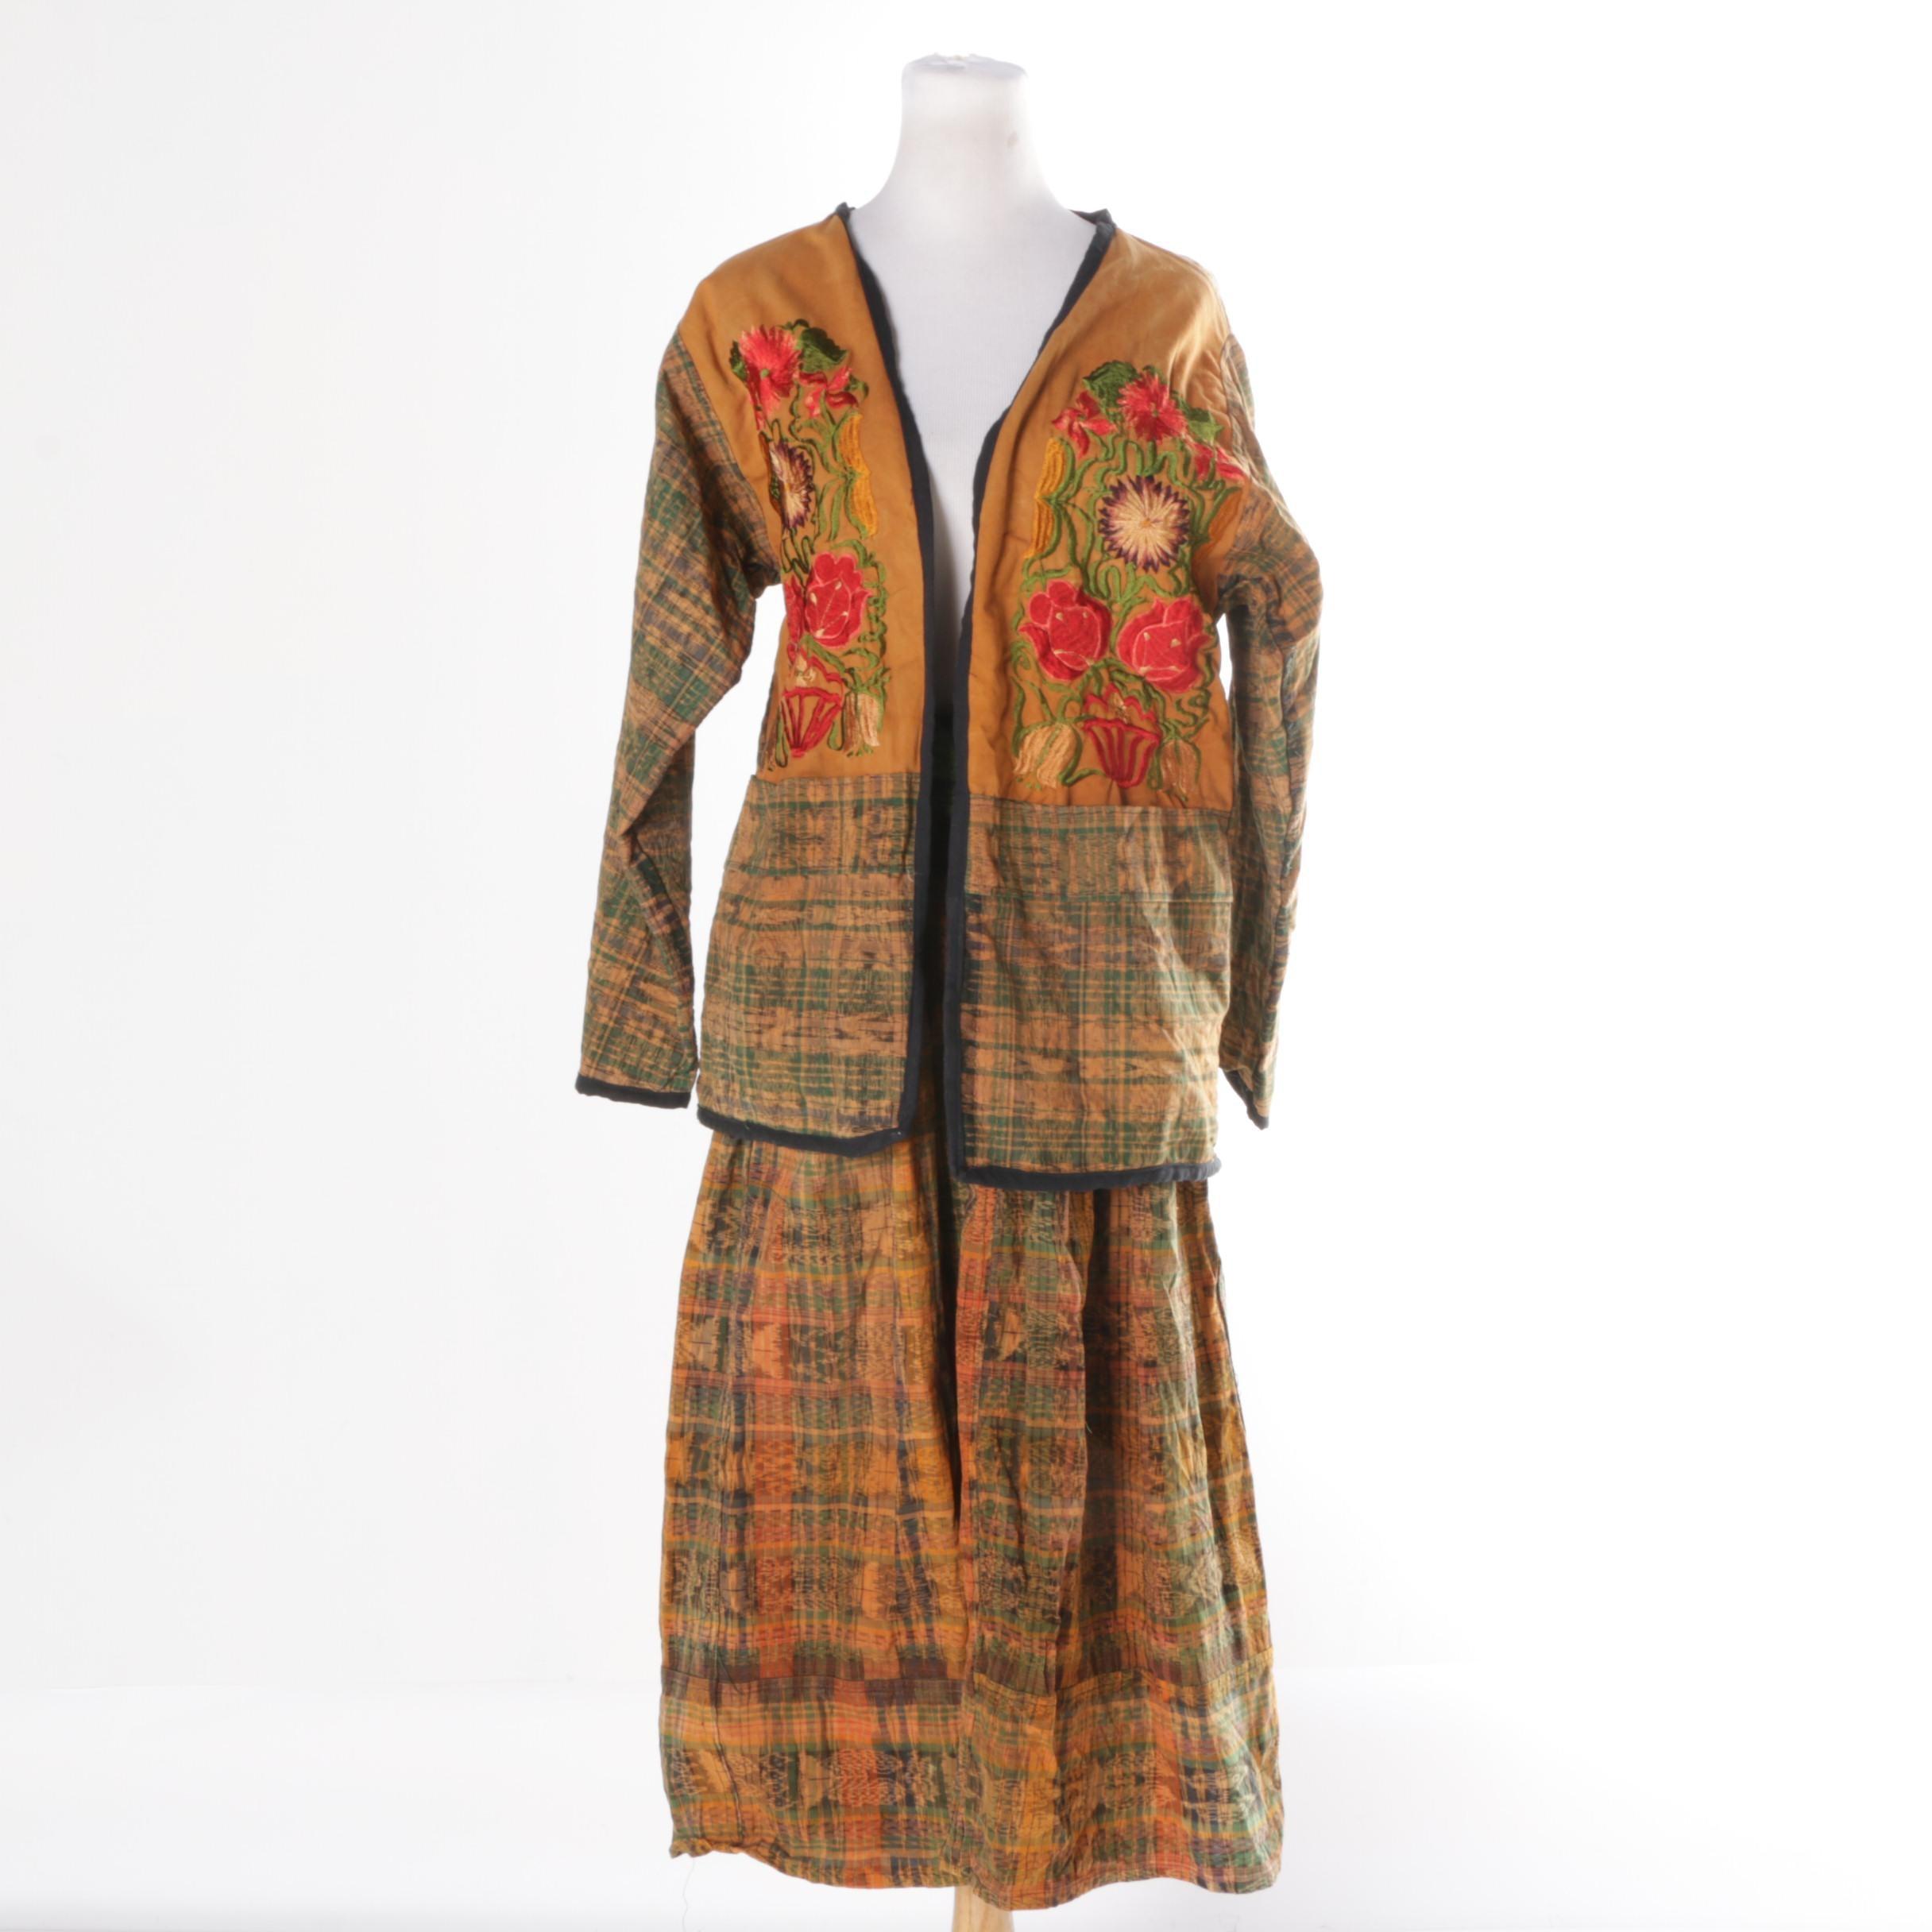 Women's Vintage Guatemalan Skirt and Jacket